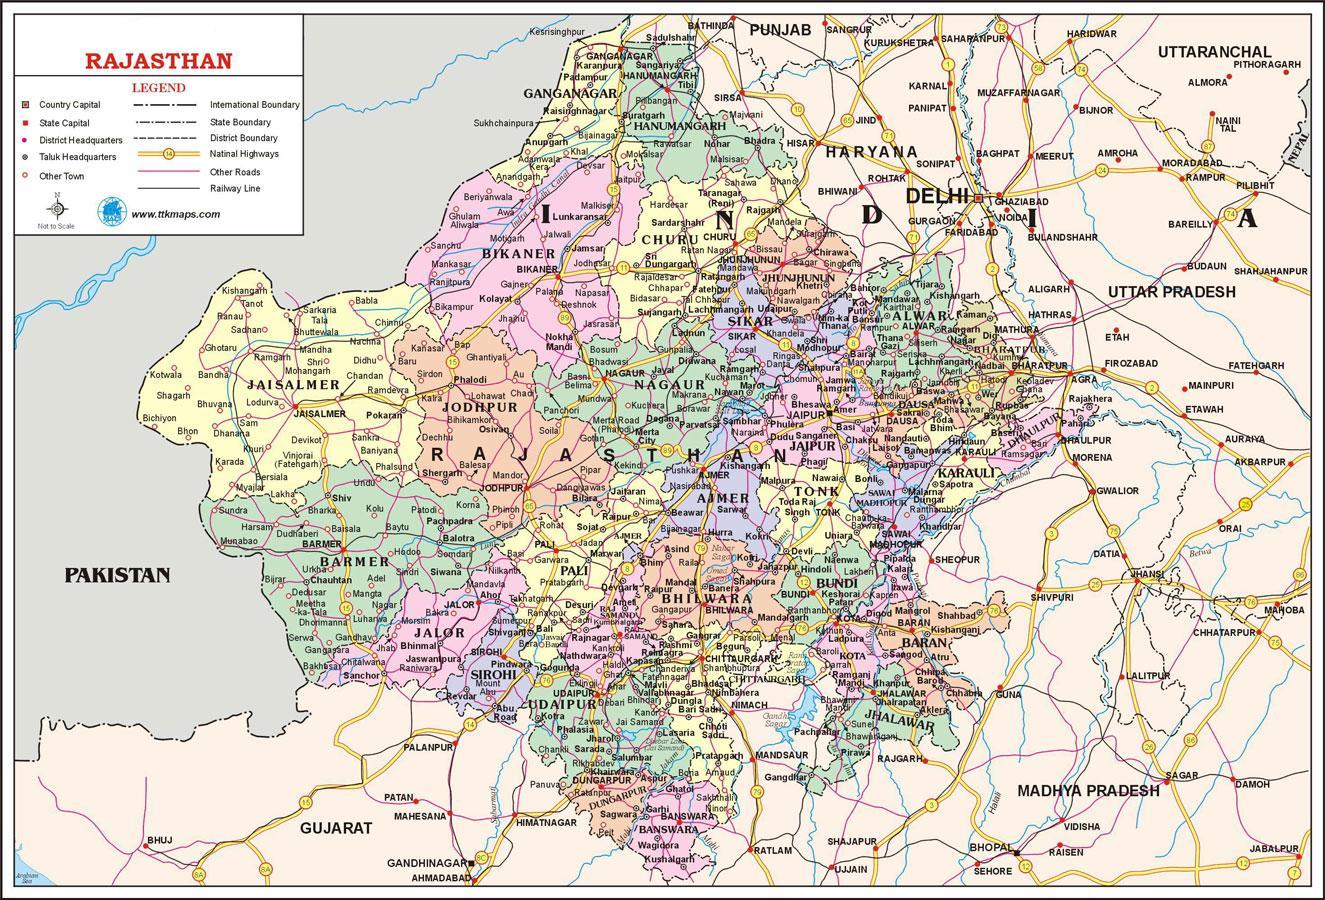 Rajasthan Road Map RAS EXAM 2013: Rajasthan Road Map AND Map of India Rajasthan Road Map